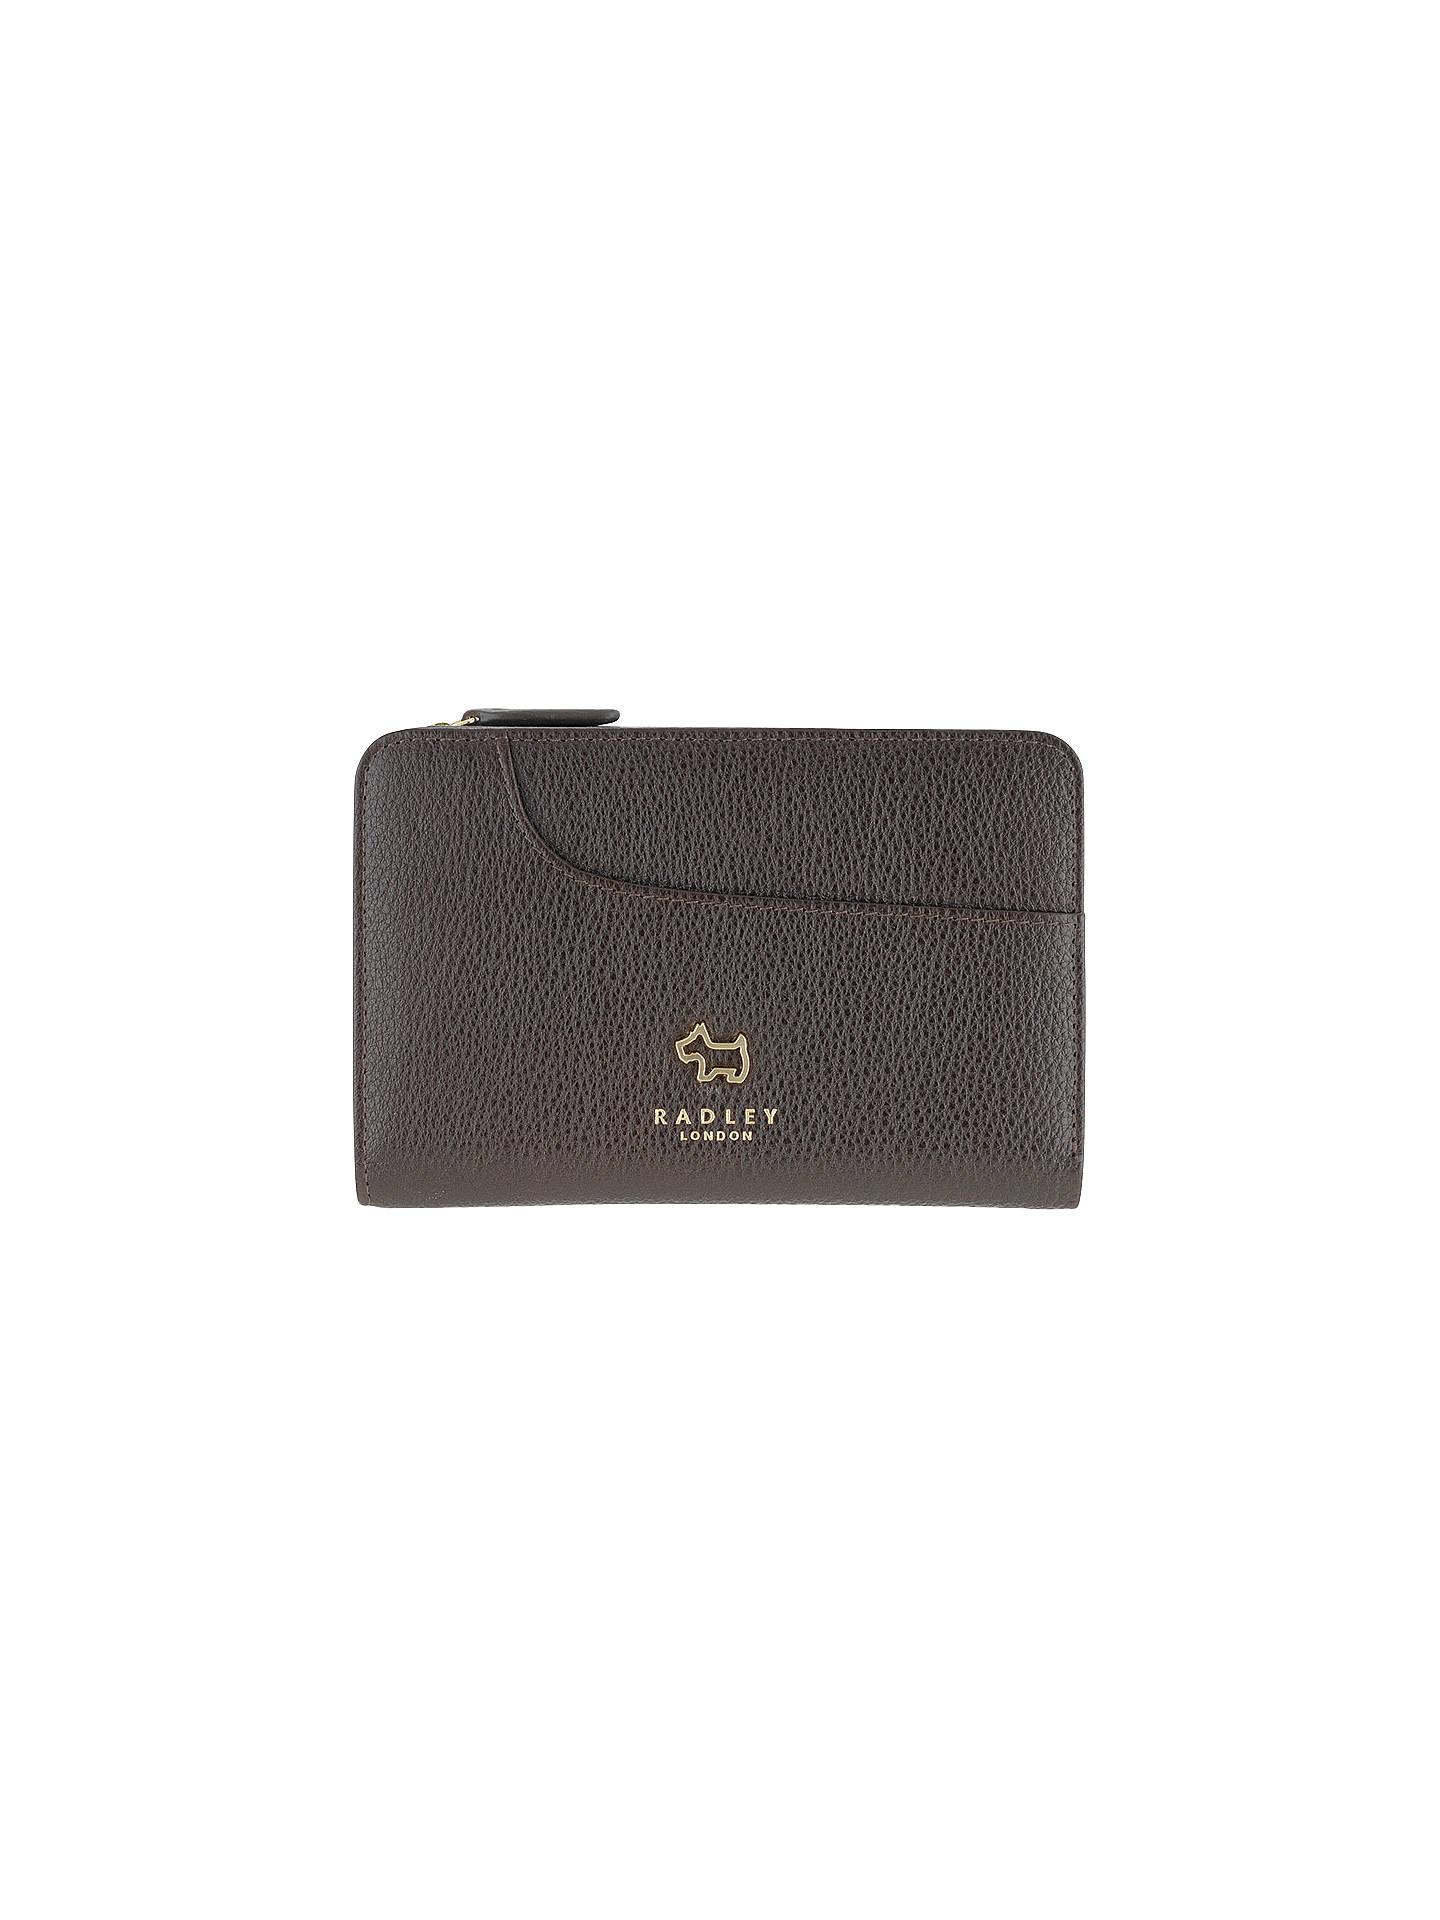 e2fb2f4aada3 Radley Pockets Leather Medium Zip-Top Purse at John Lewis   Partners